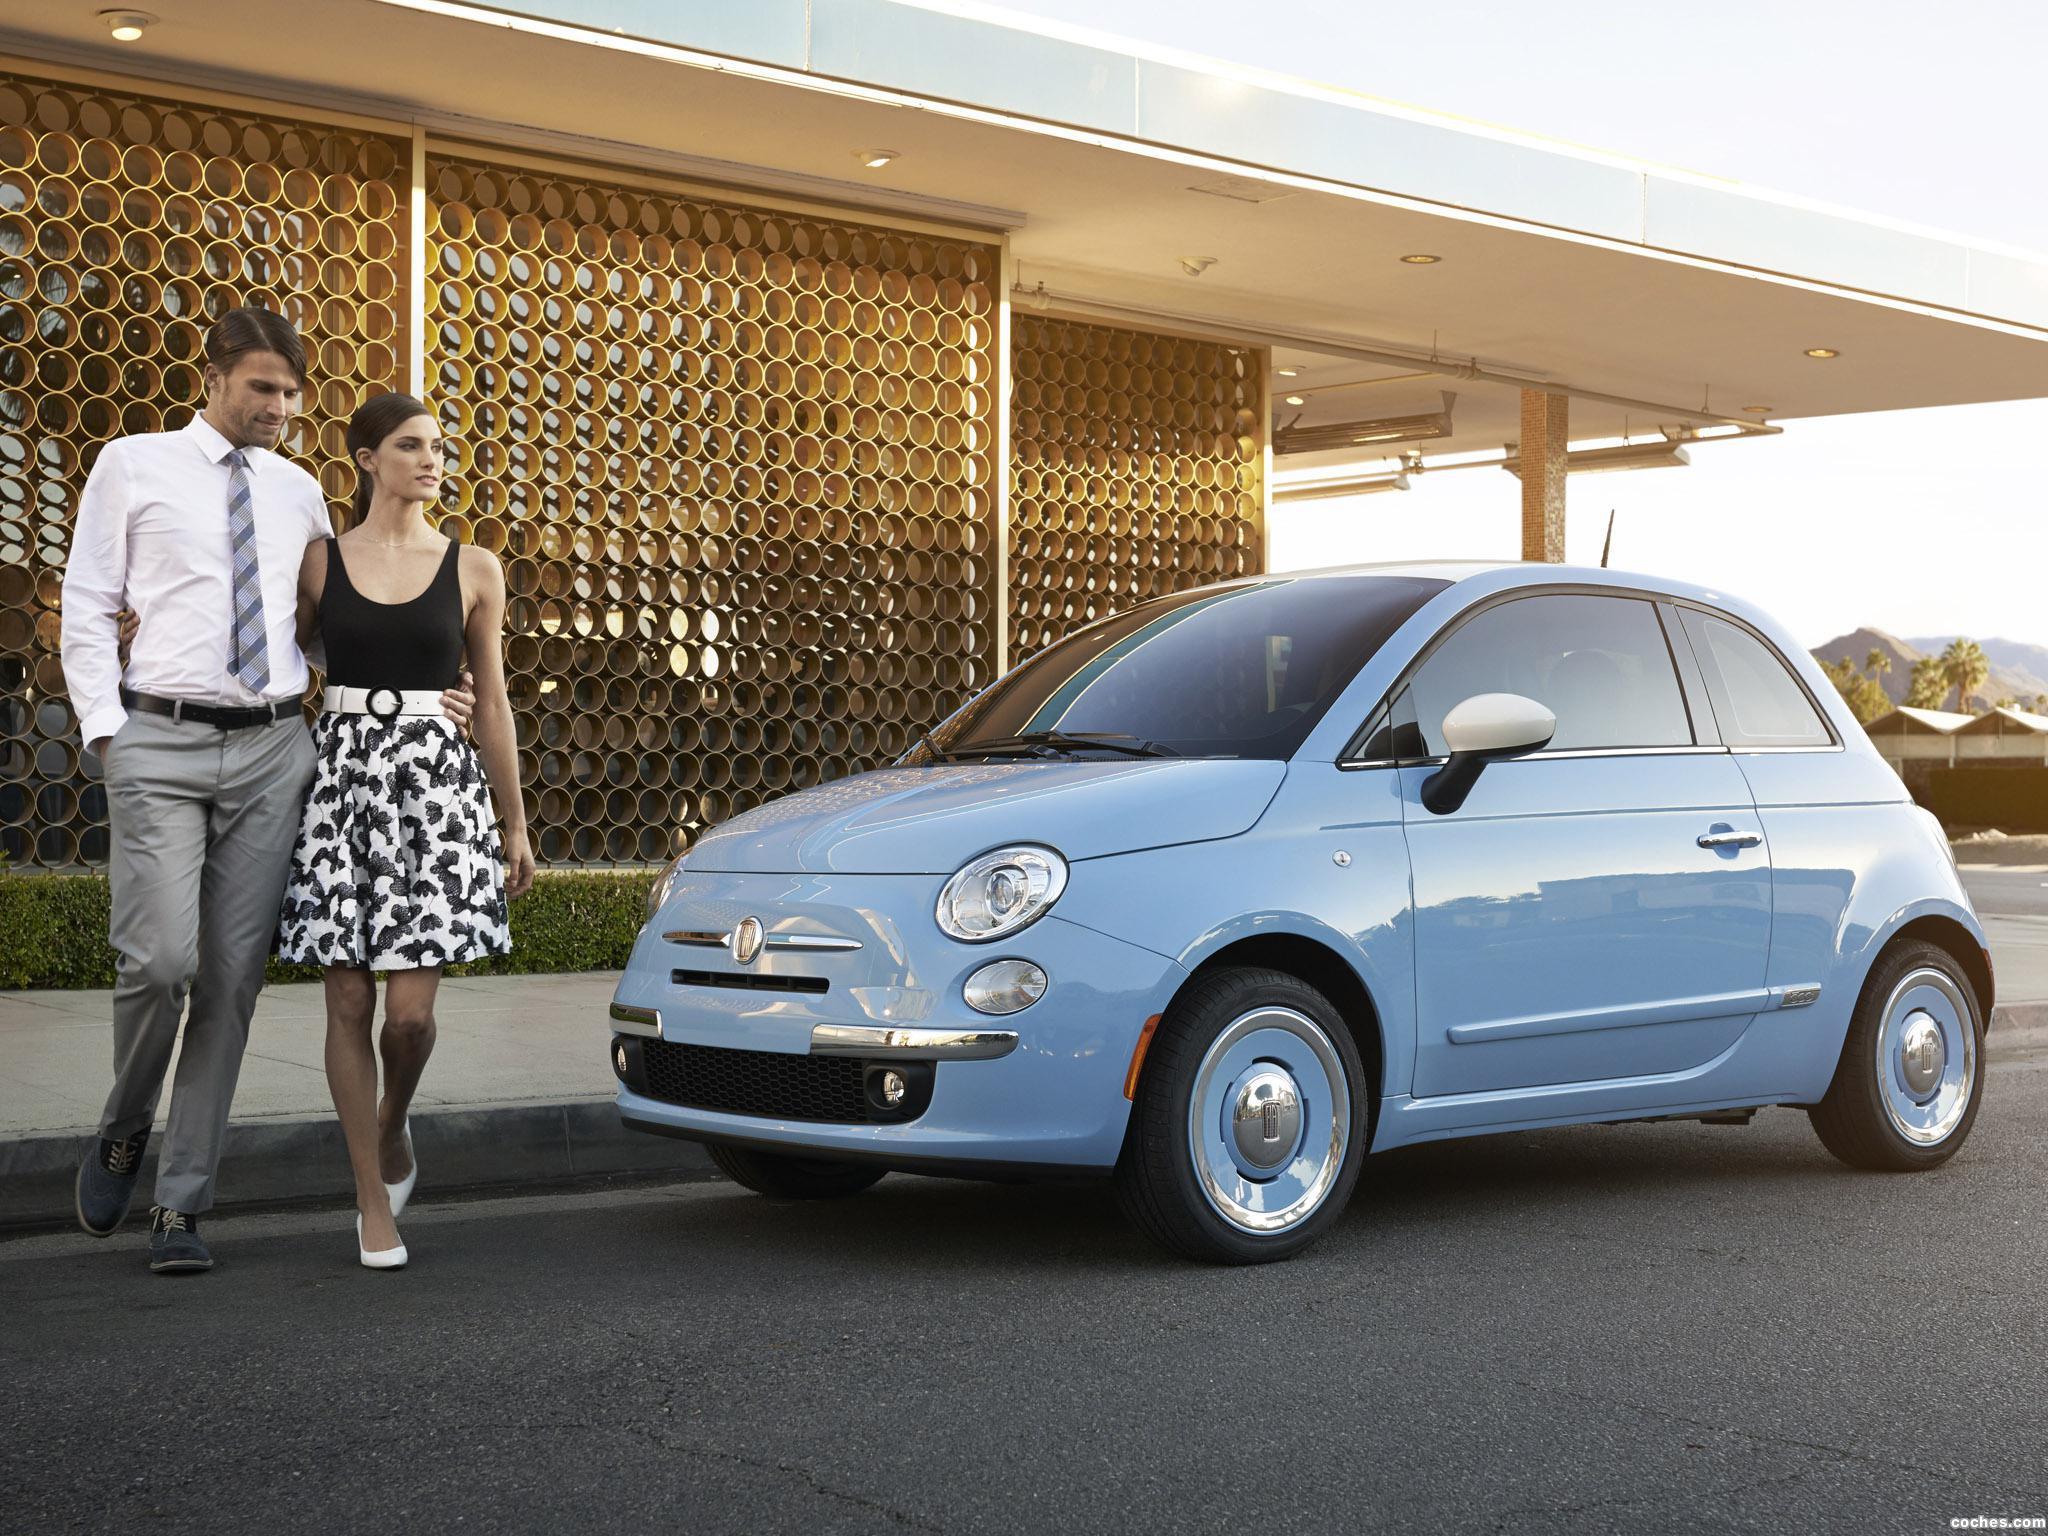 Foto 0 de Fiat 500 1957 Edition 2014